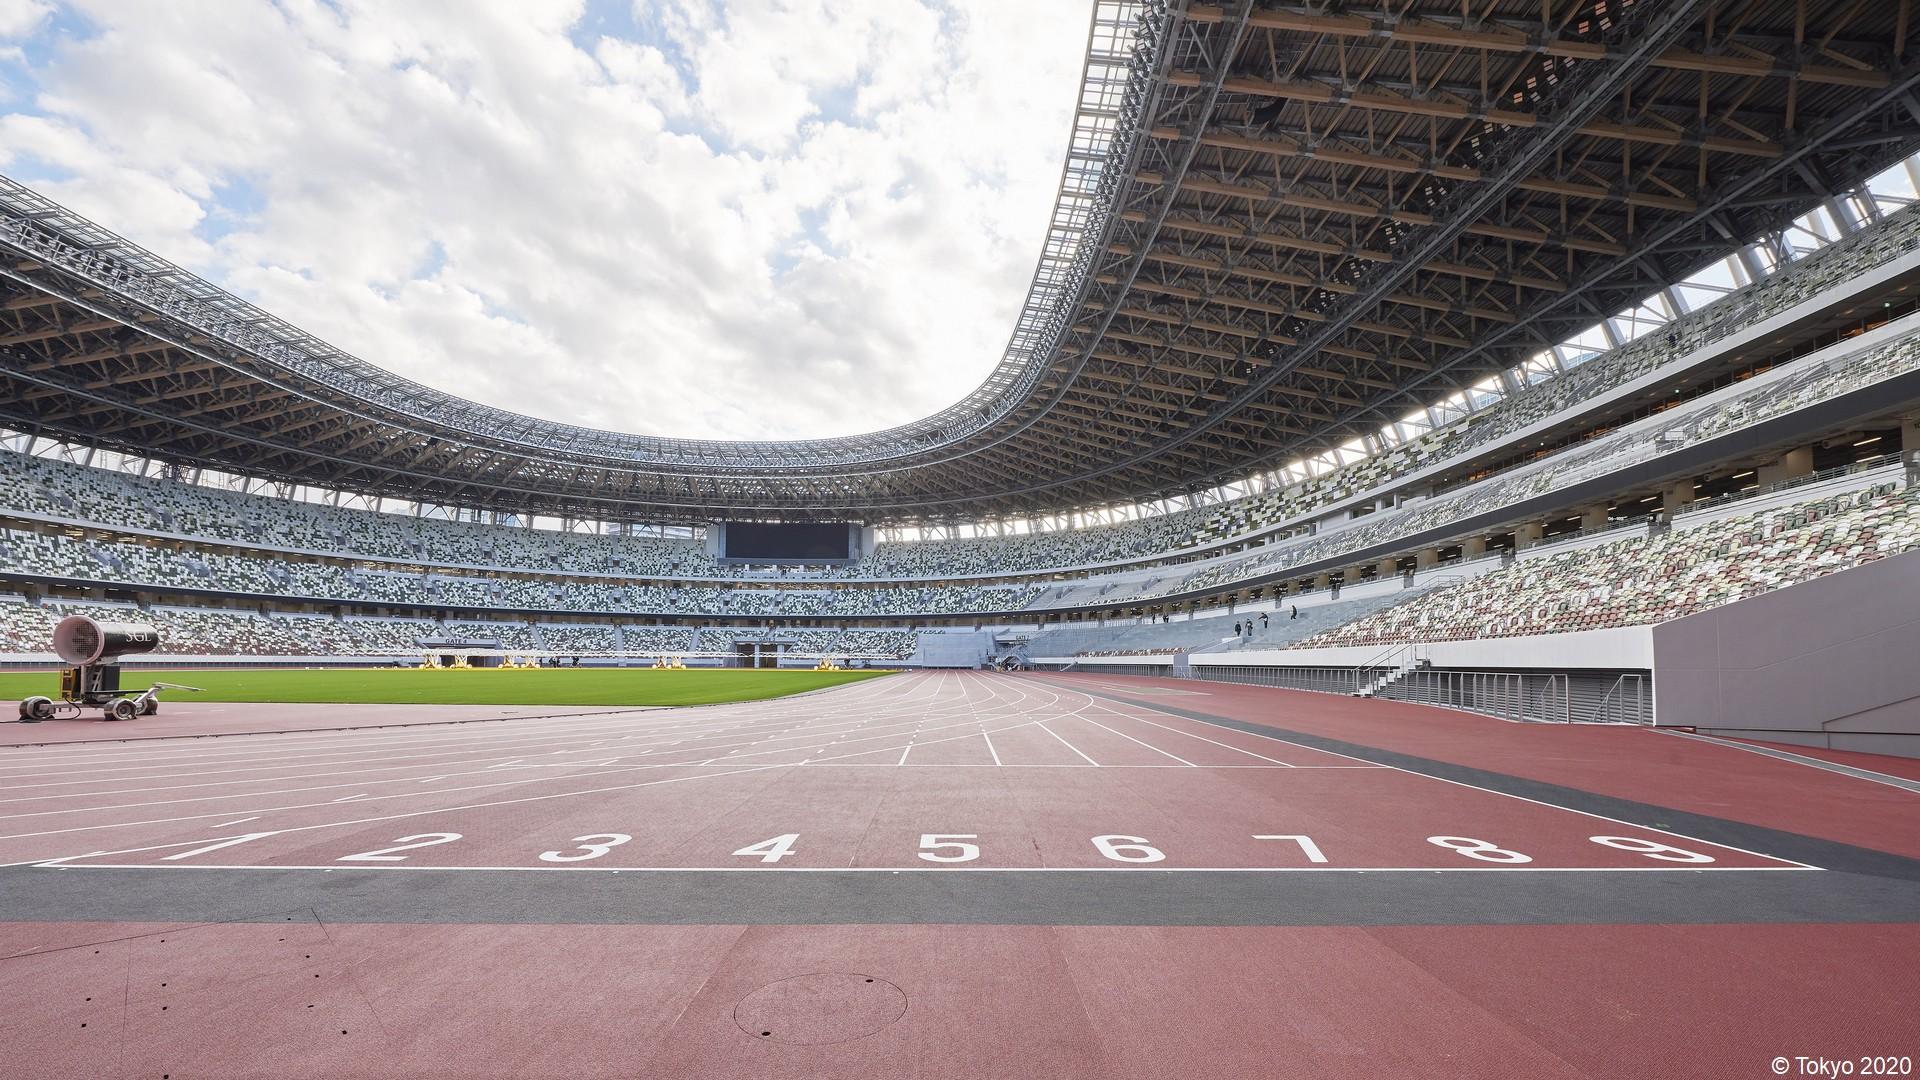 Tokyo 2020 – Stade olympique vide